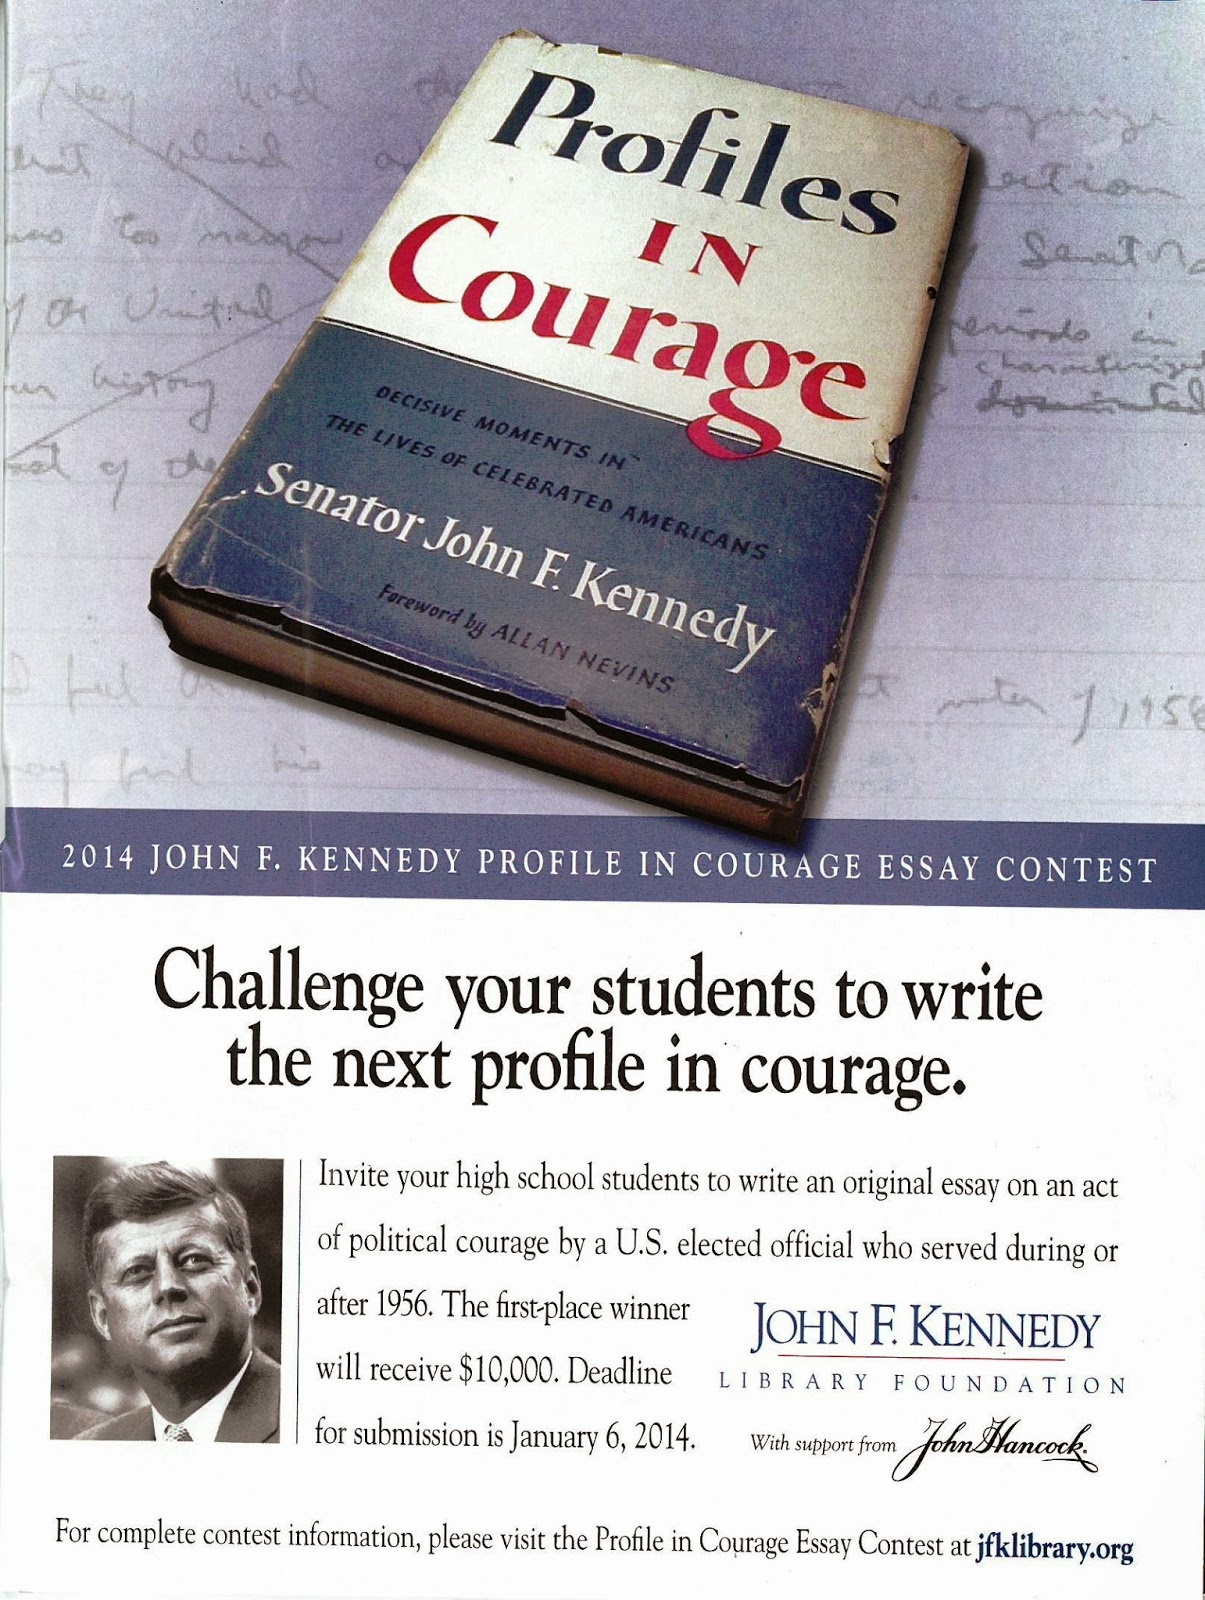 Profiles in Courage - Wikipedia